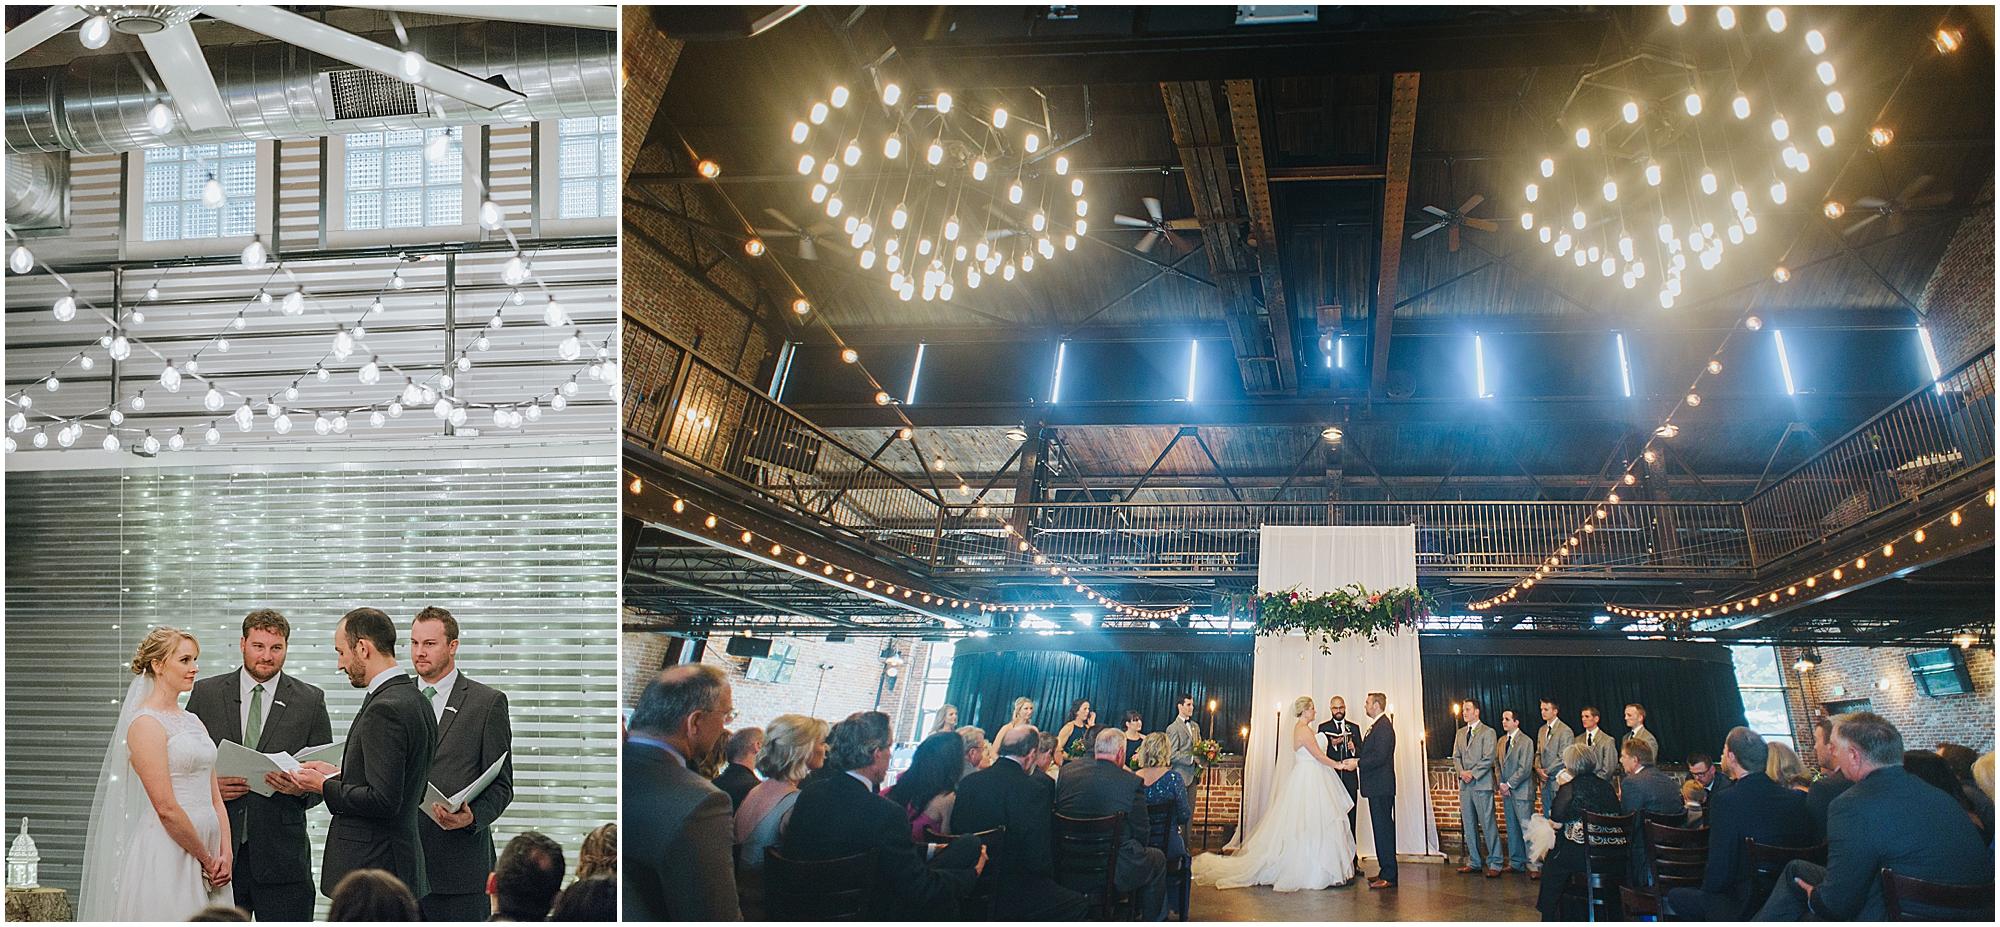 ceremonies with dramatic lighting